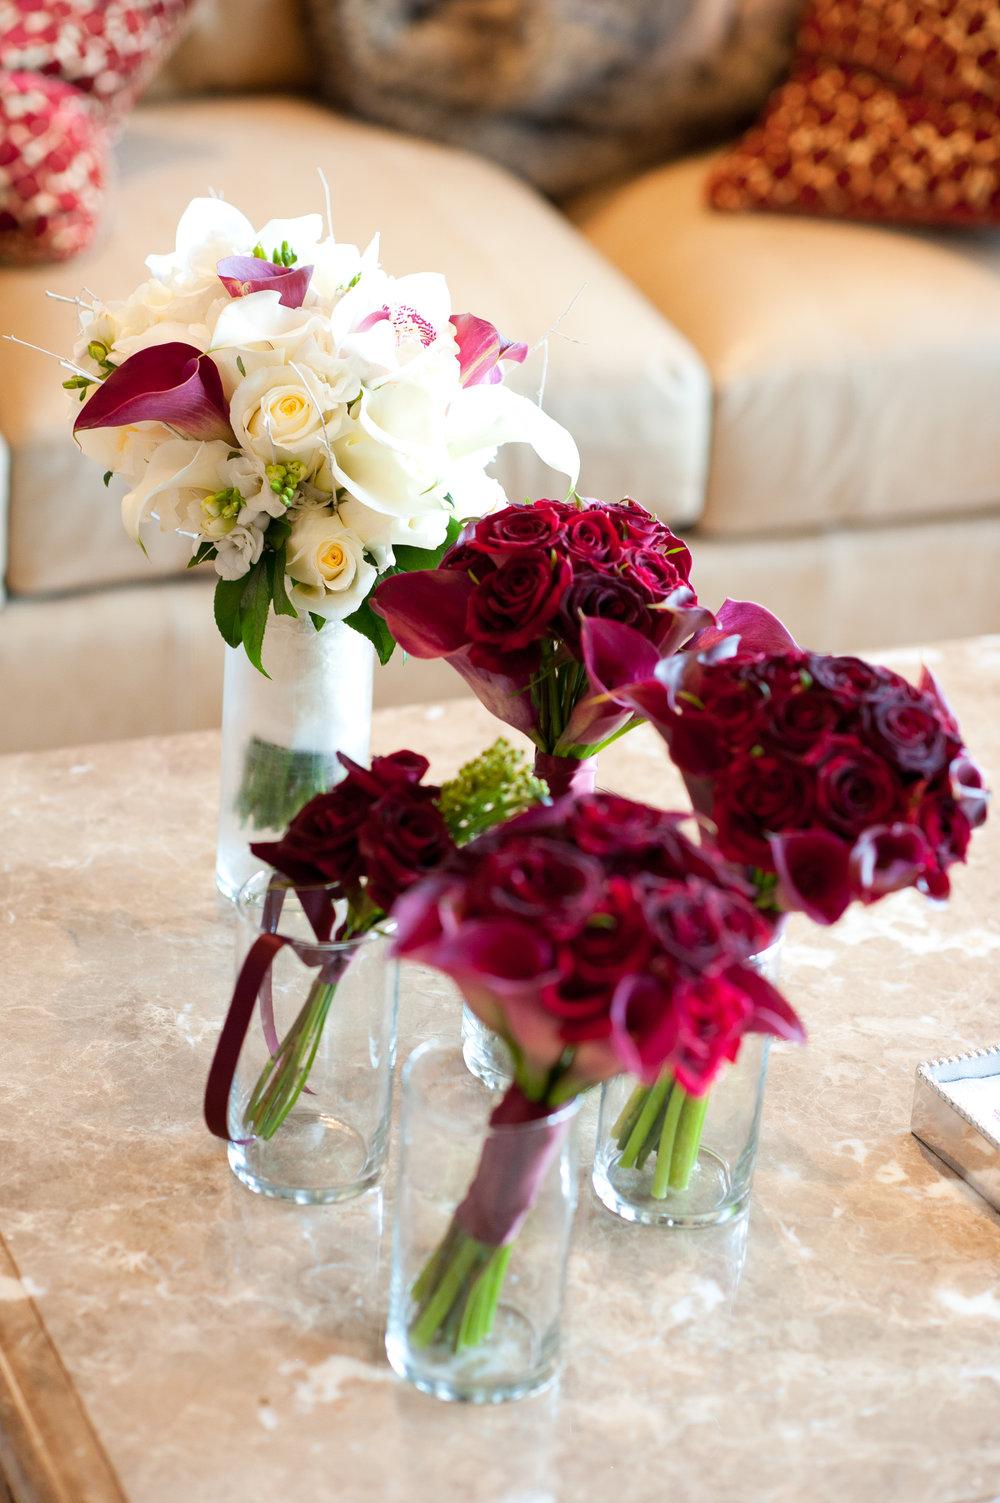 Boquets in vases.jpg